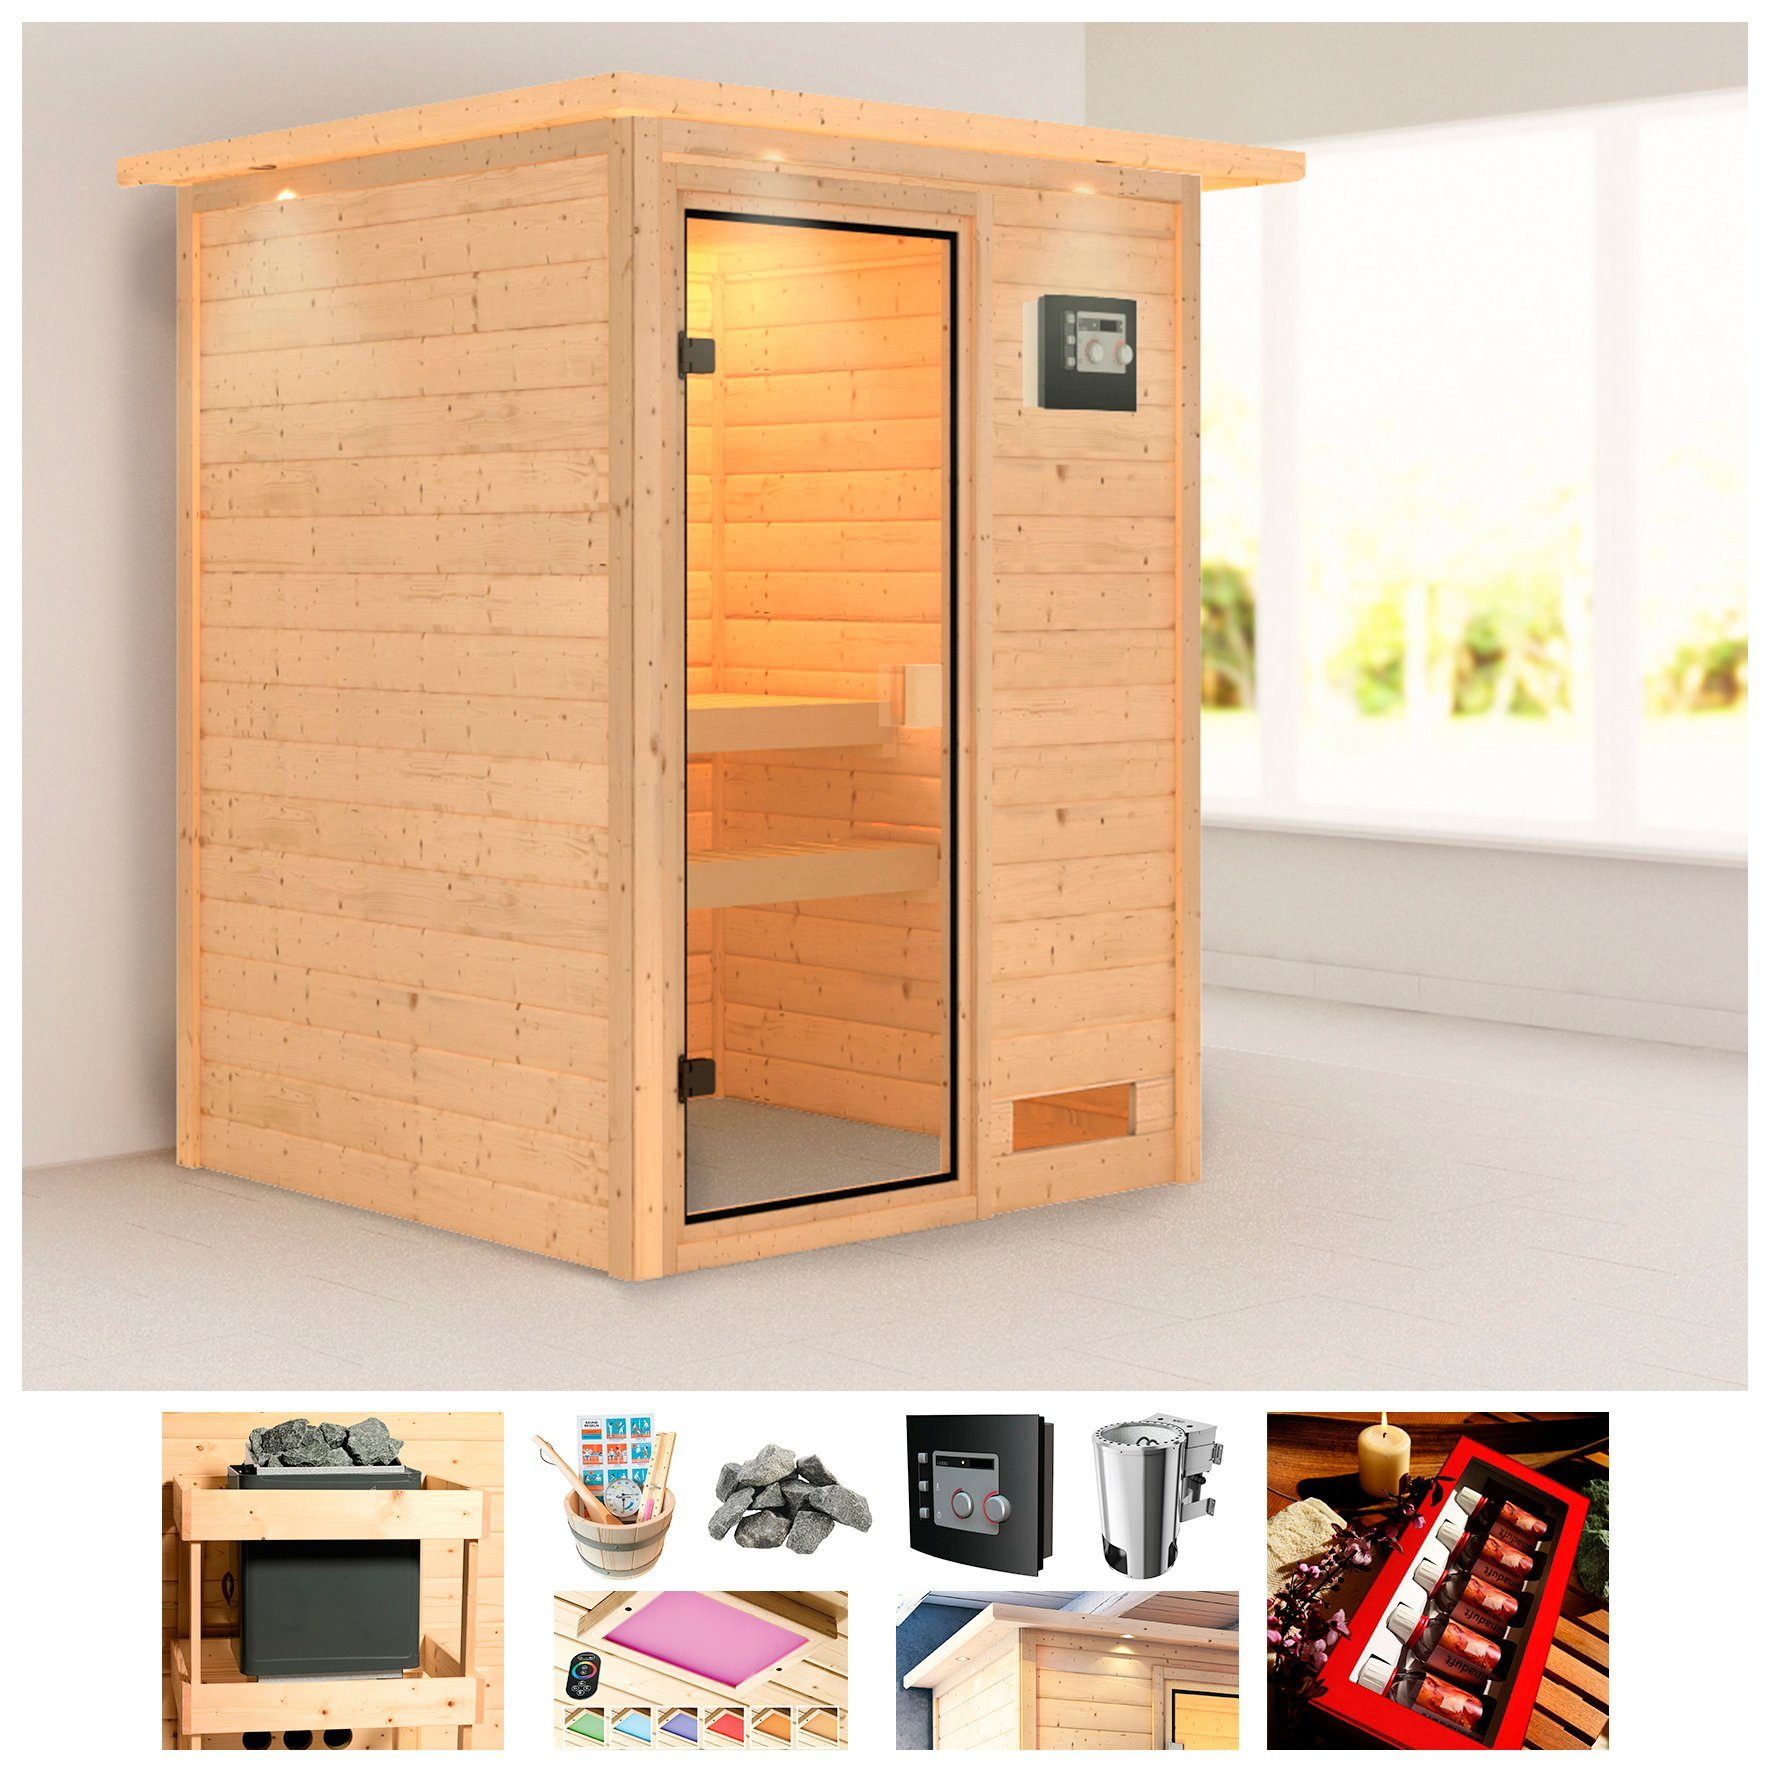 KONIFERA Sauna »Borkum«, BxTxH: 174x160x202 cm, 3,6 kW Bio-Kombiofen, ext. Steuerung